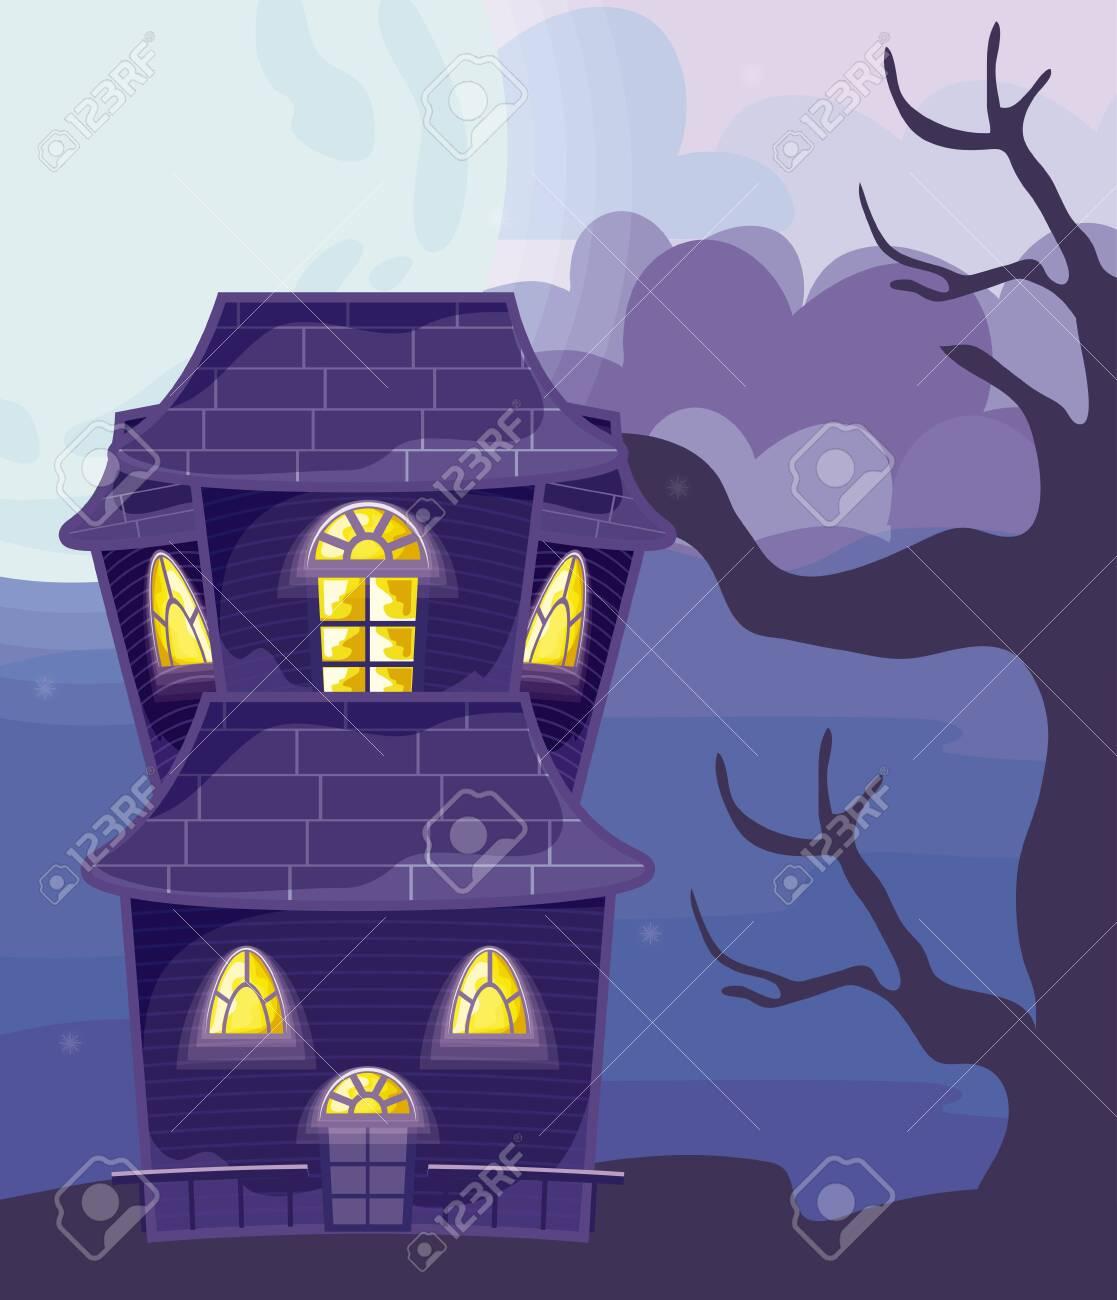 halloween horror house on halloween scene vector illustration design - 153827391